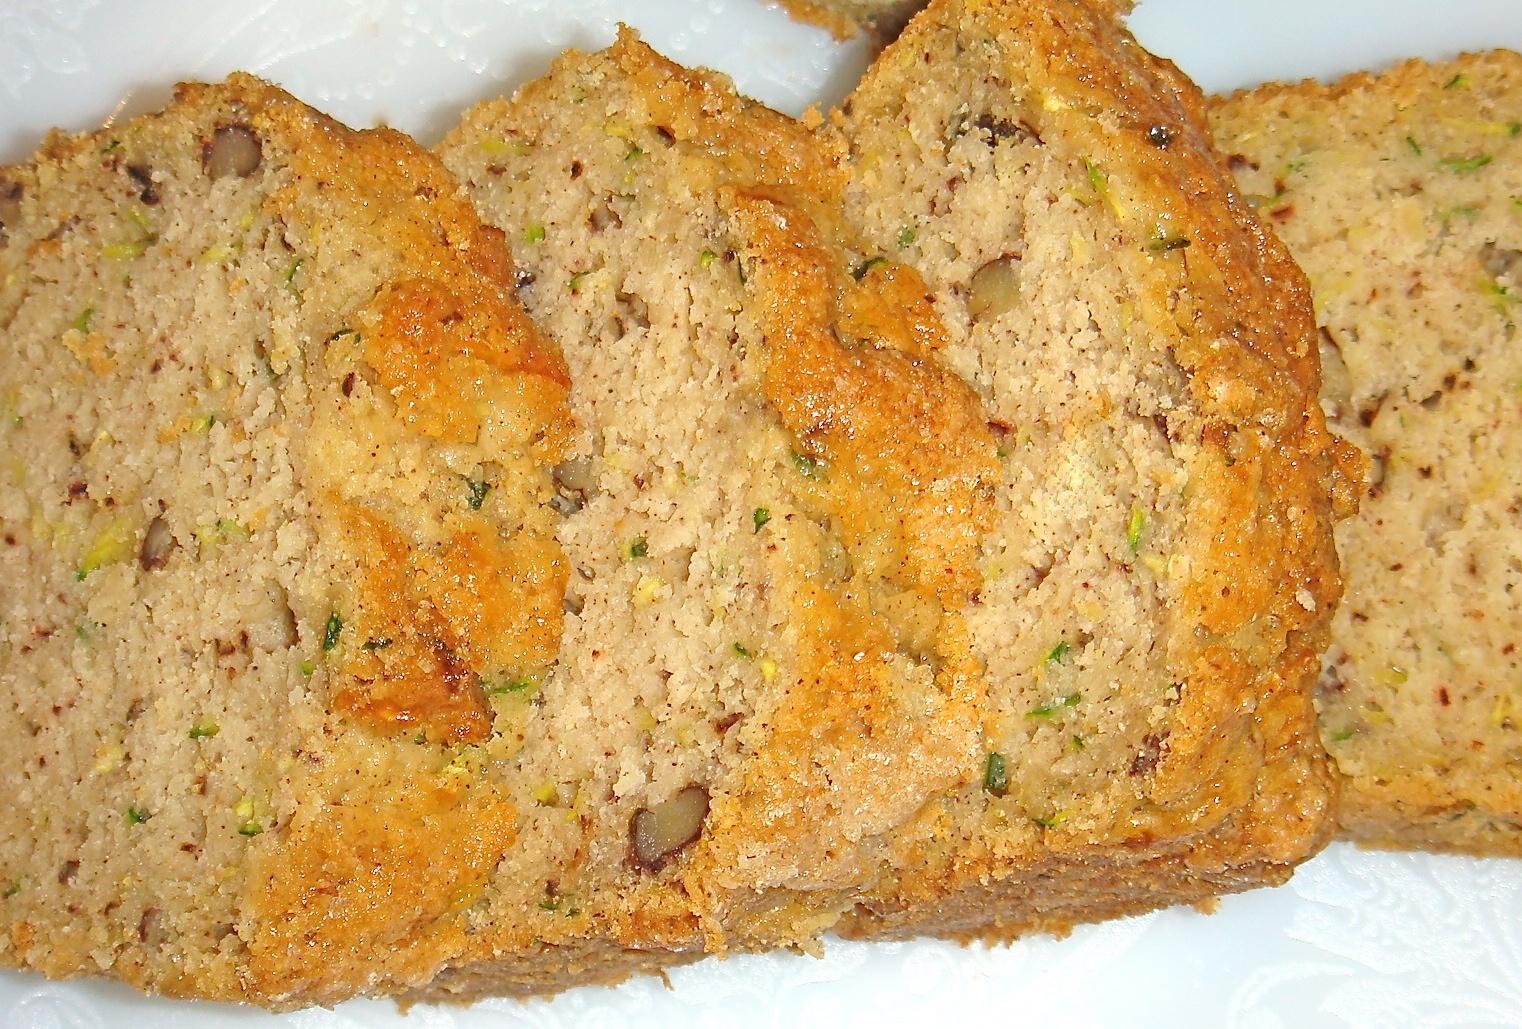 Gluten-free Zucchini Bread Recipe on Food52